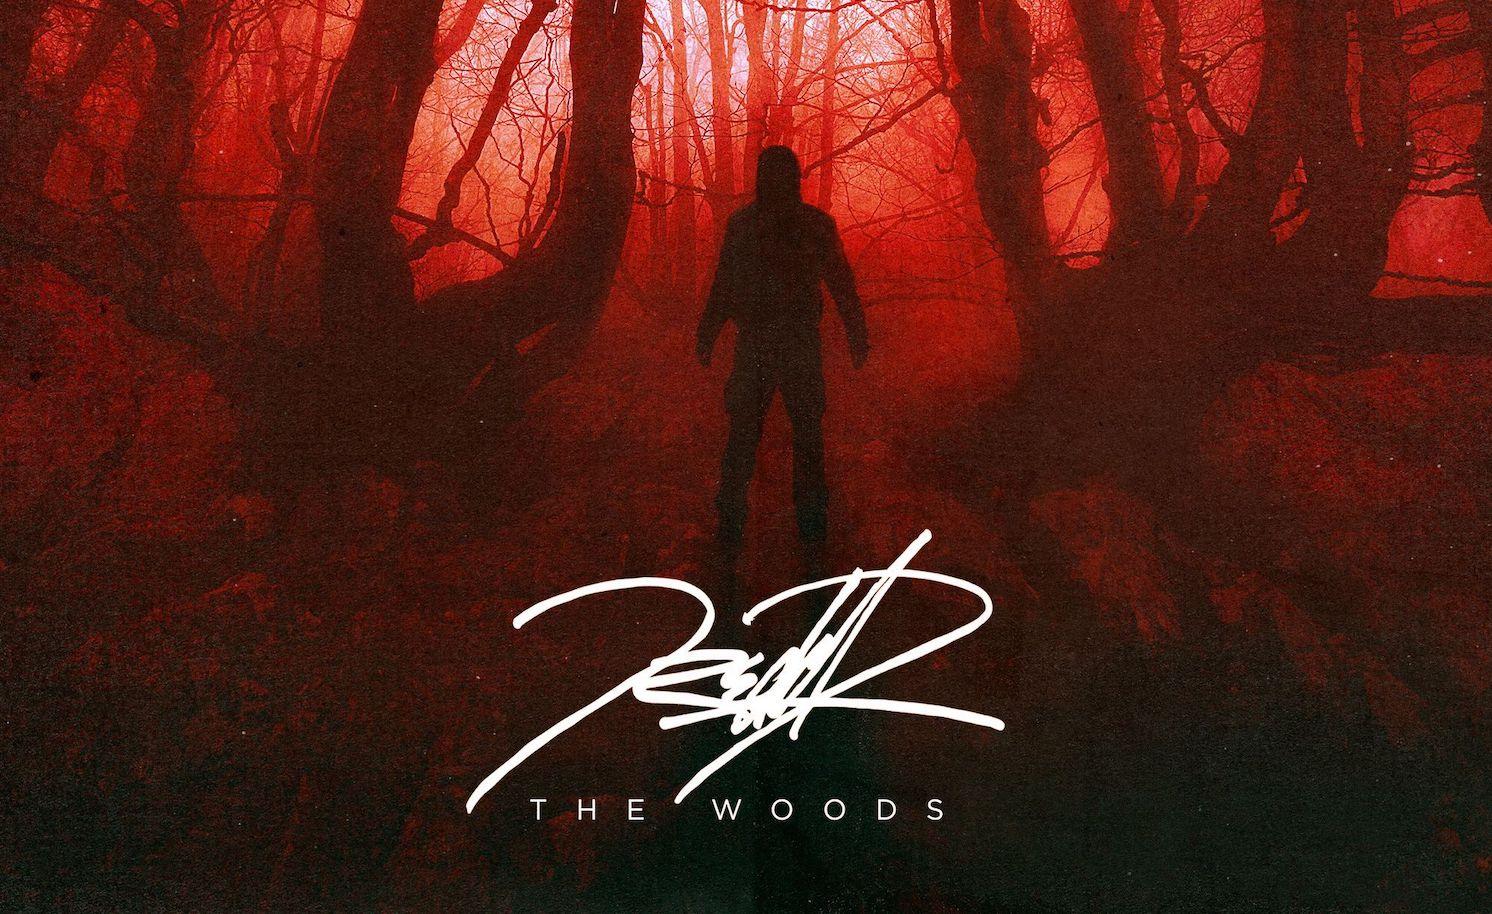 dreddd the woods